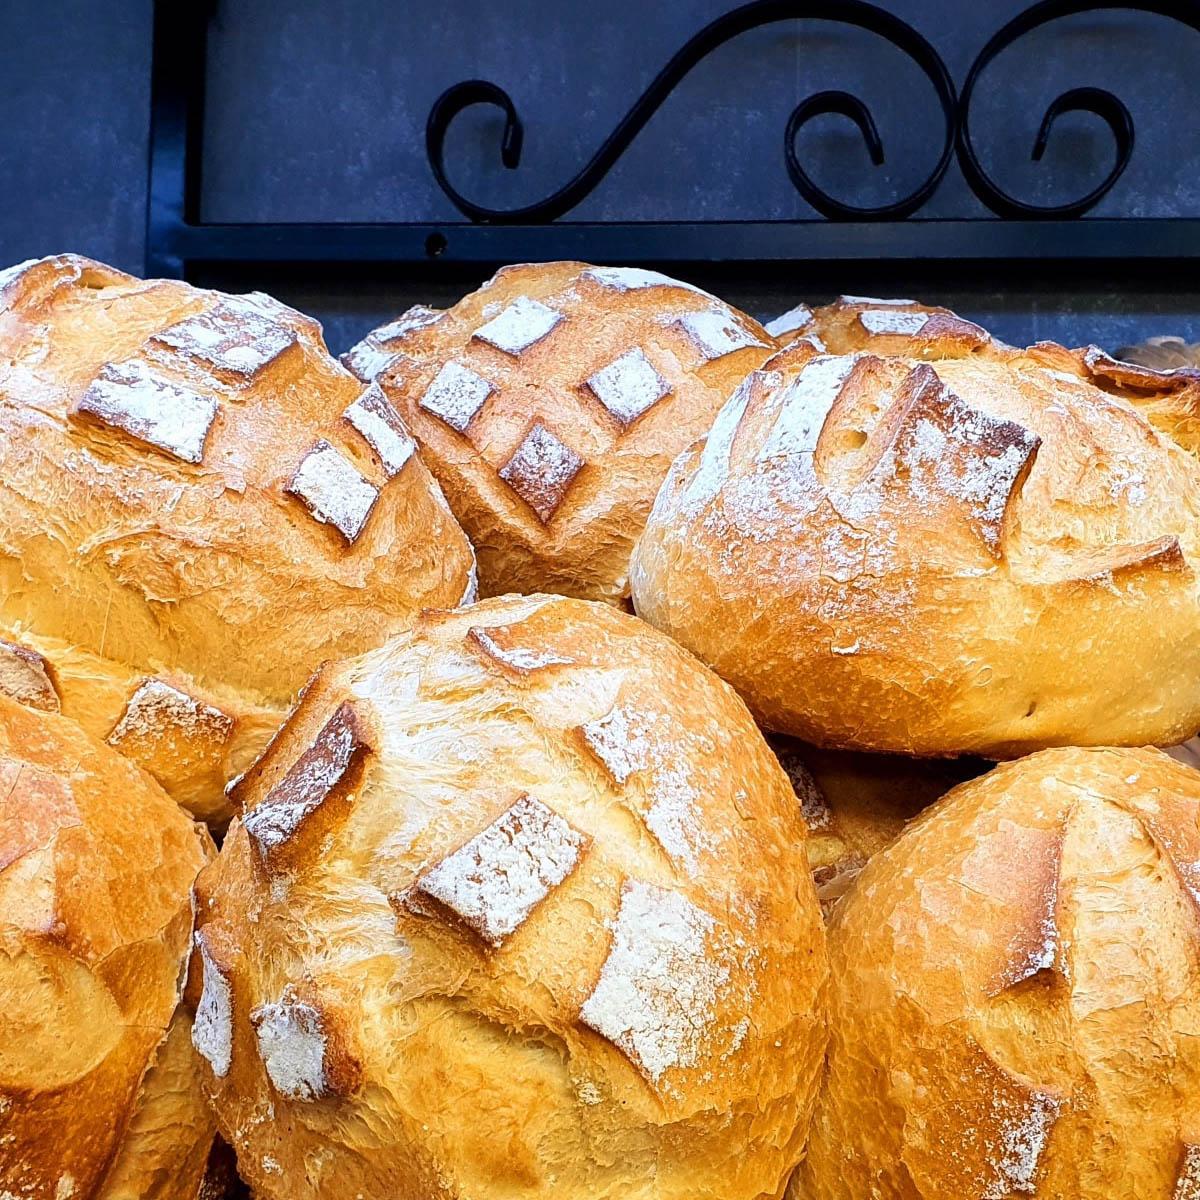 Pains Boulangerie Behem